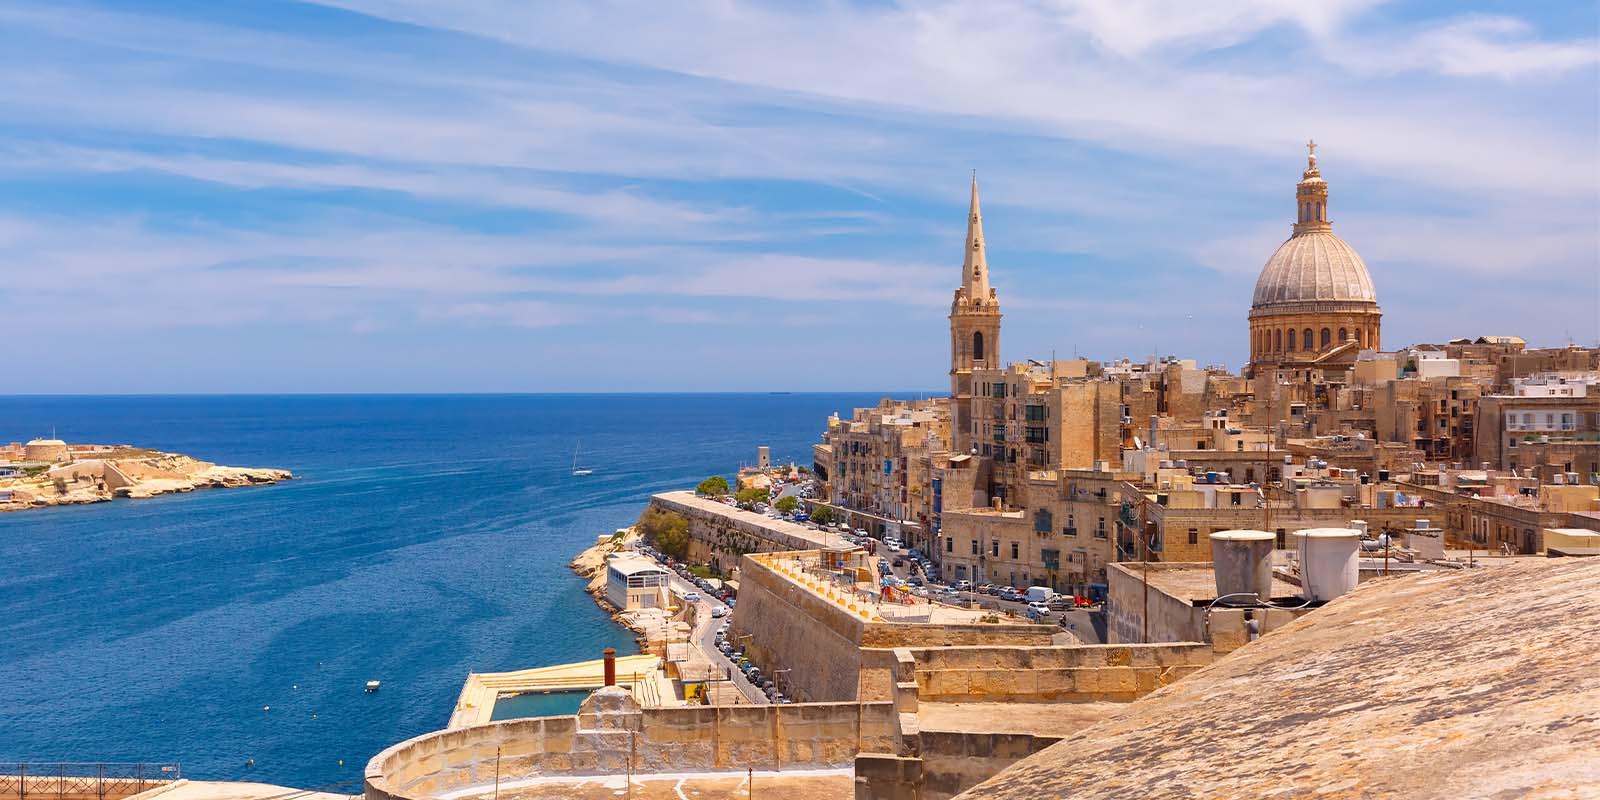 Aerial view of Valletta city in Malta